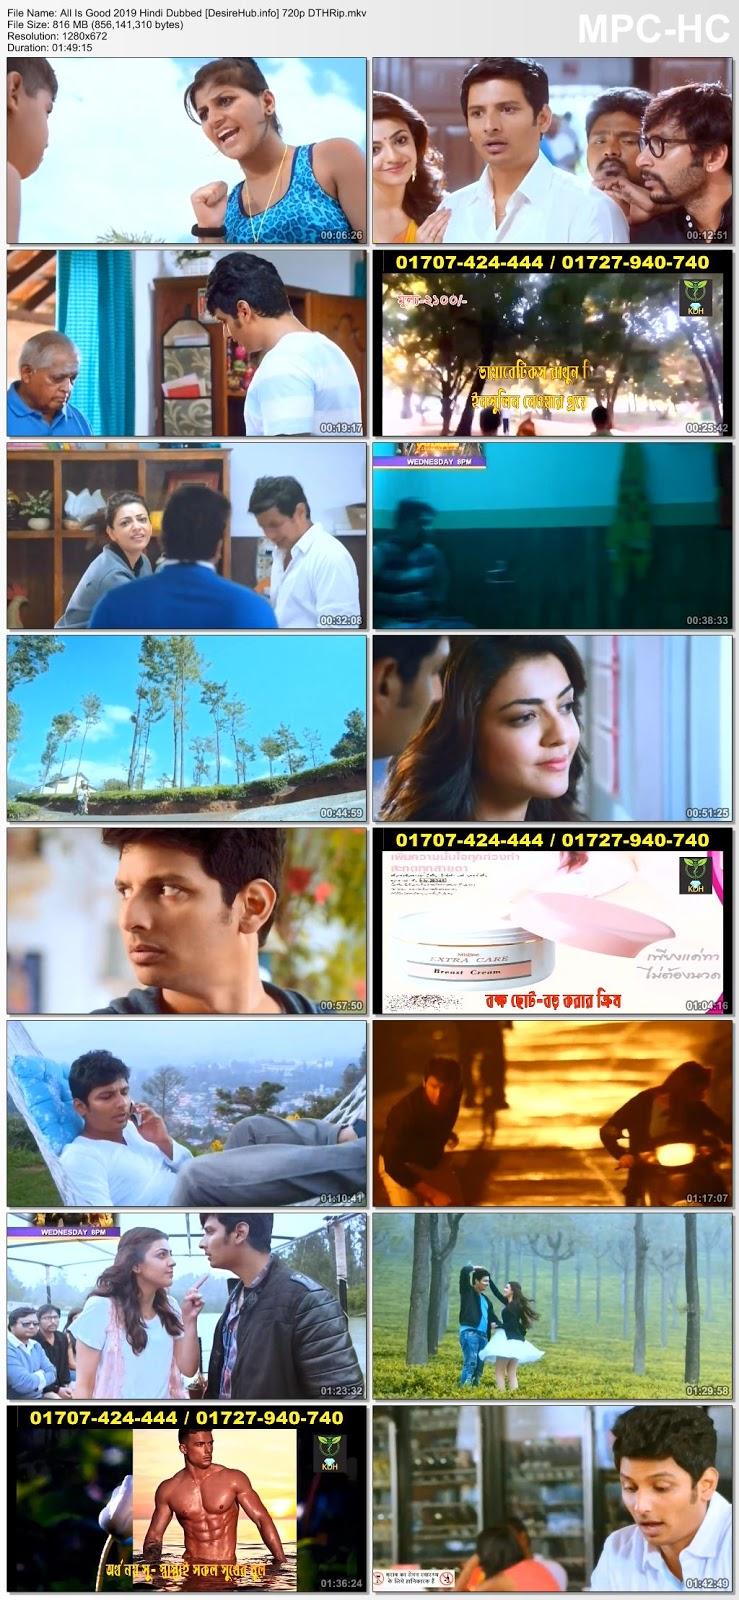 All Is Good (Kavalai Vendam) 2019 Hindi Dubbed 480p DTHRip 300MB Desirehub